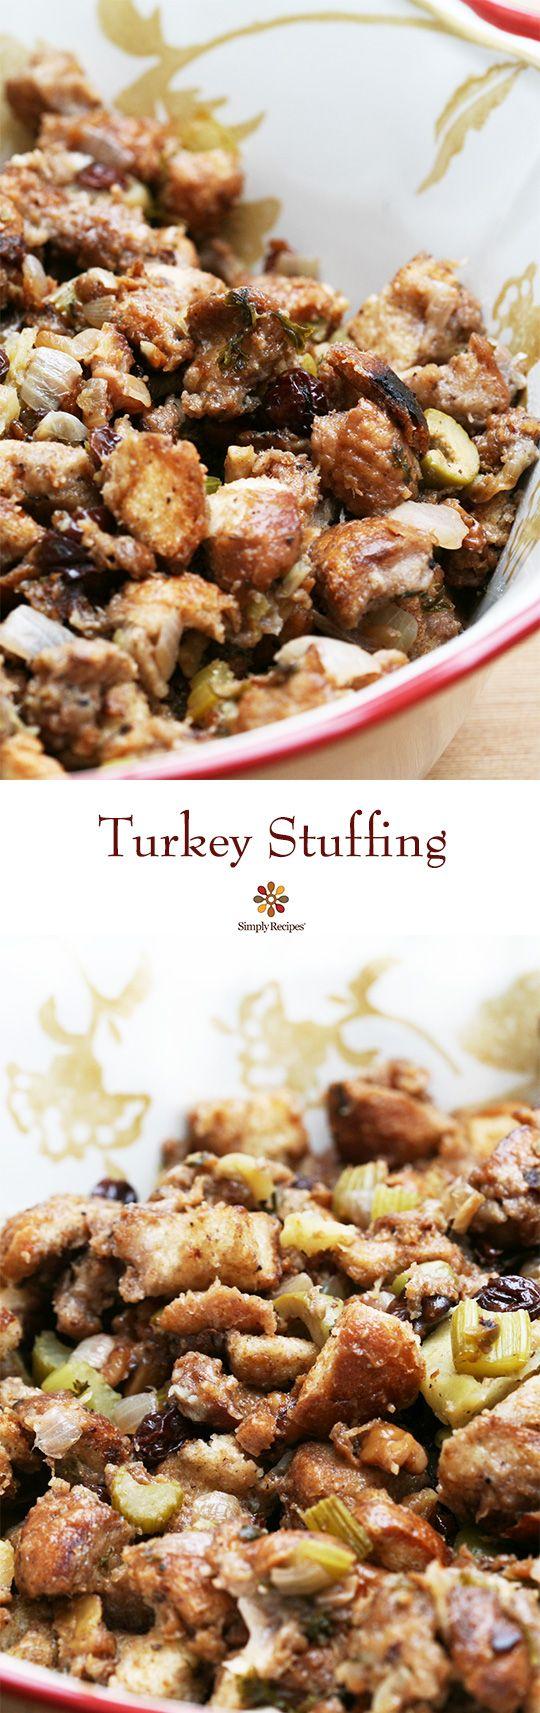 Mom's Stovetop Turkey Stuffing Recipe | SimplyRecipes.com